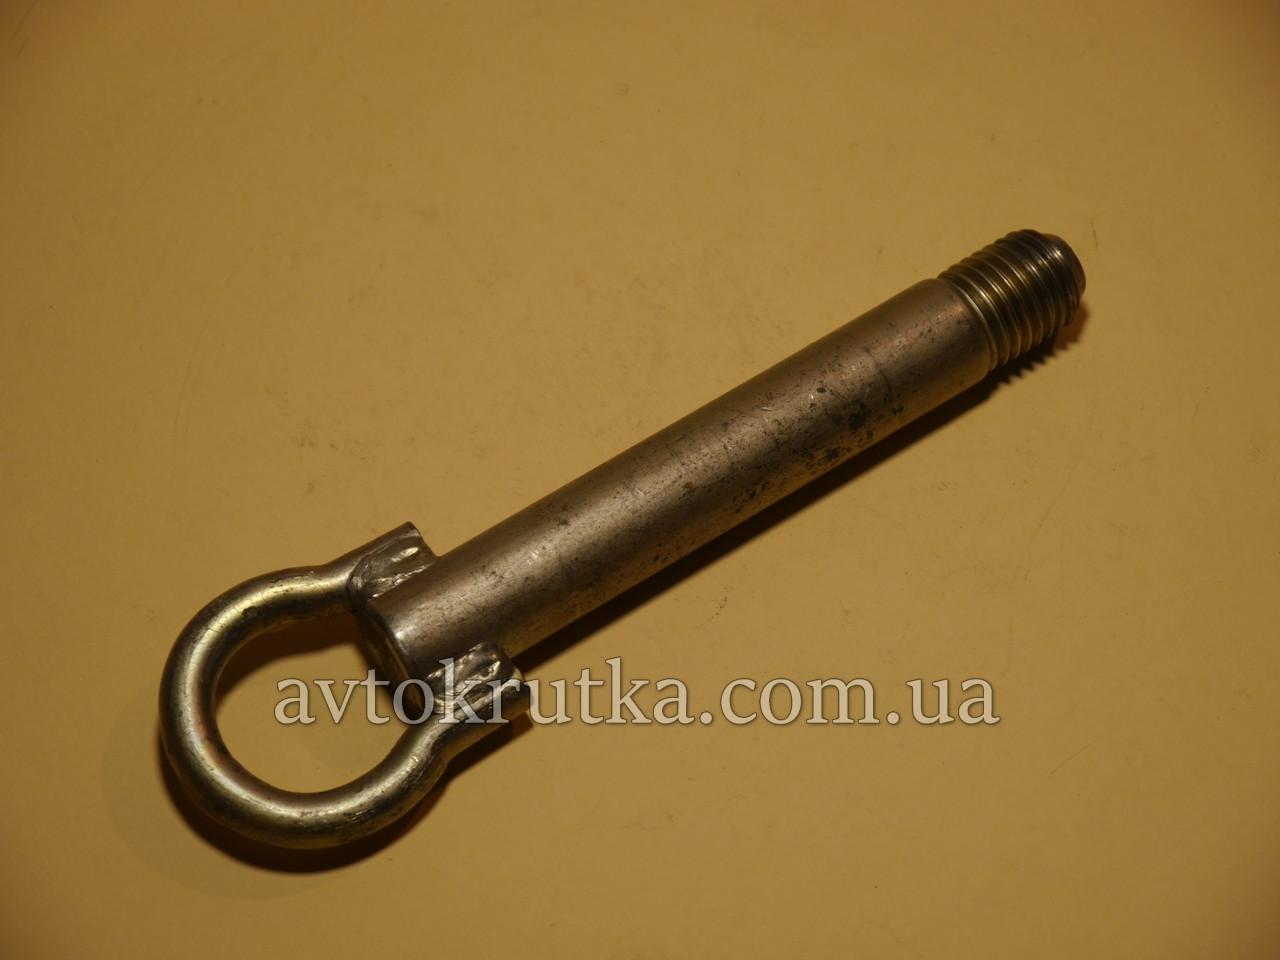 Буксировочный крюк Mazda 5 (Мазда 5) C23750EJ0